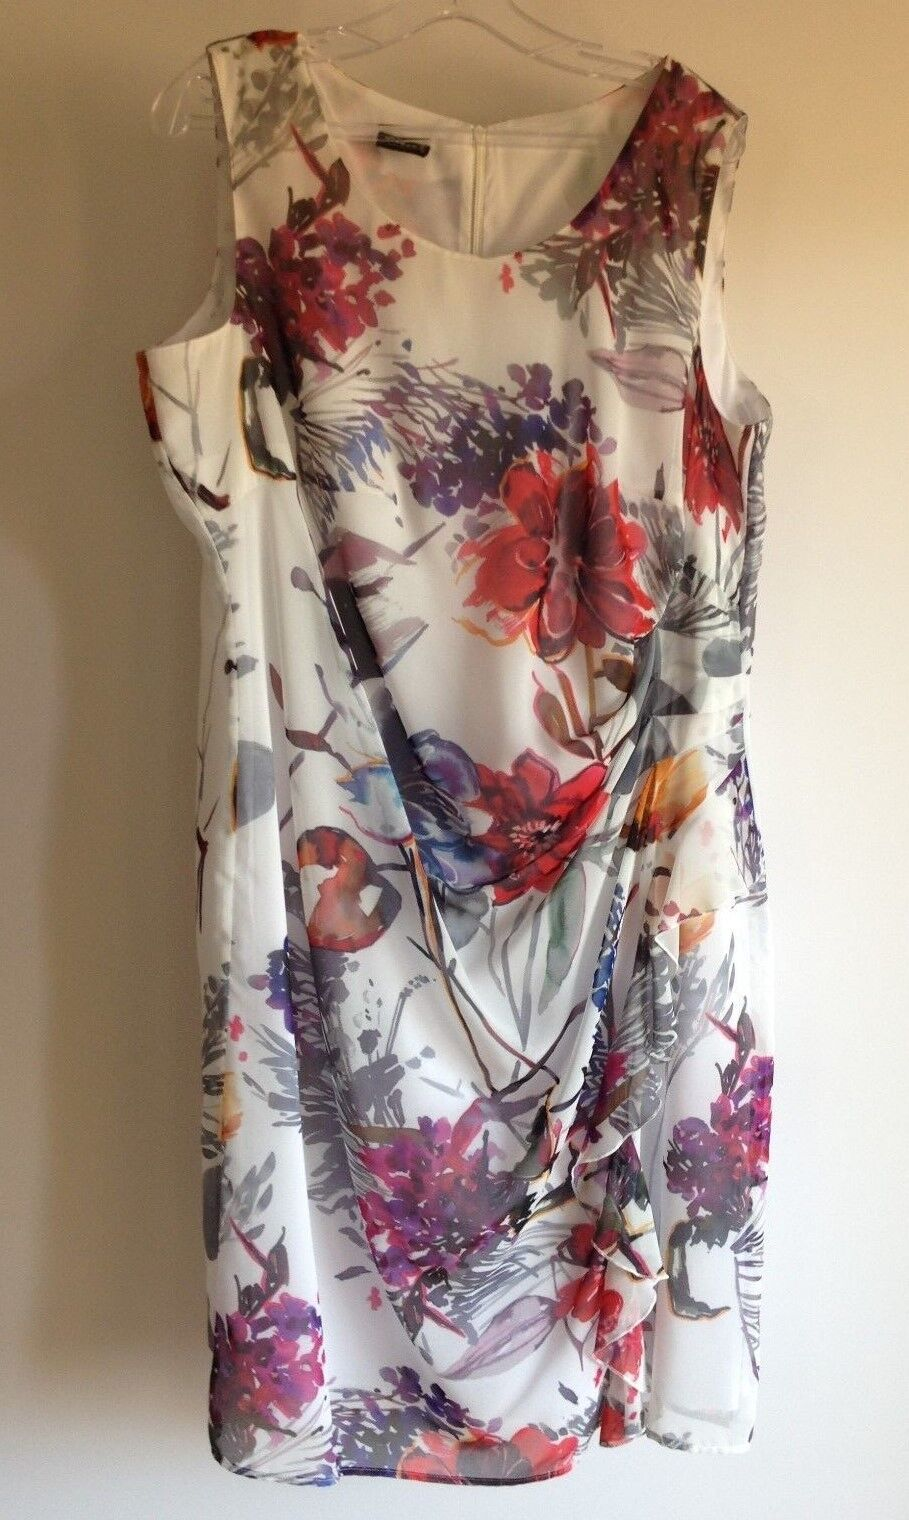 konkurrenzfähiger Preis 3af05 da9c1 Etuikleid Coktailkleid Sommerkleid Kleid Select weiß ...